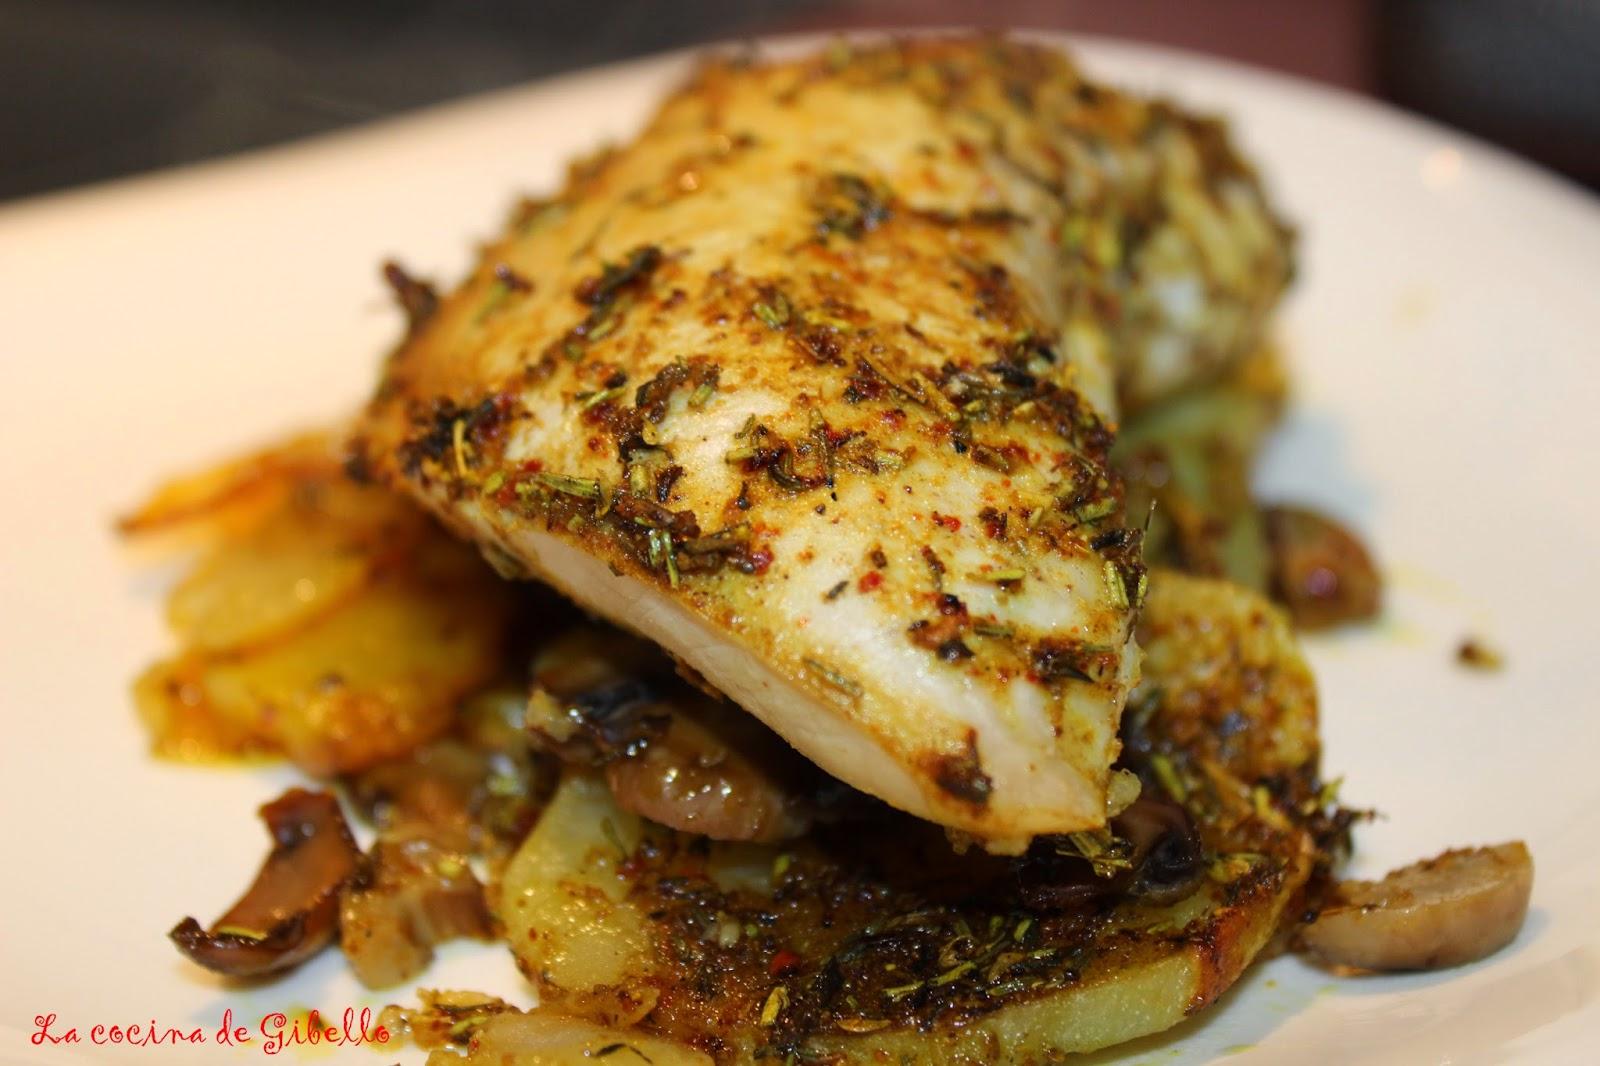 La cocina de gibello solomillo de pavo al horno con salsa - Solomillo de ternera al horno facil ...